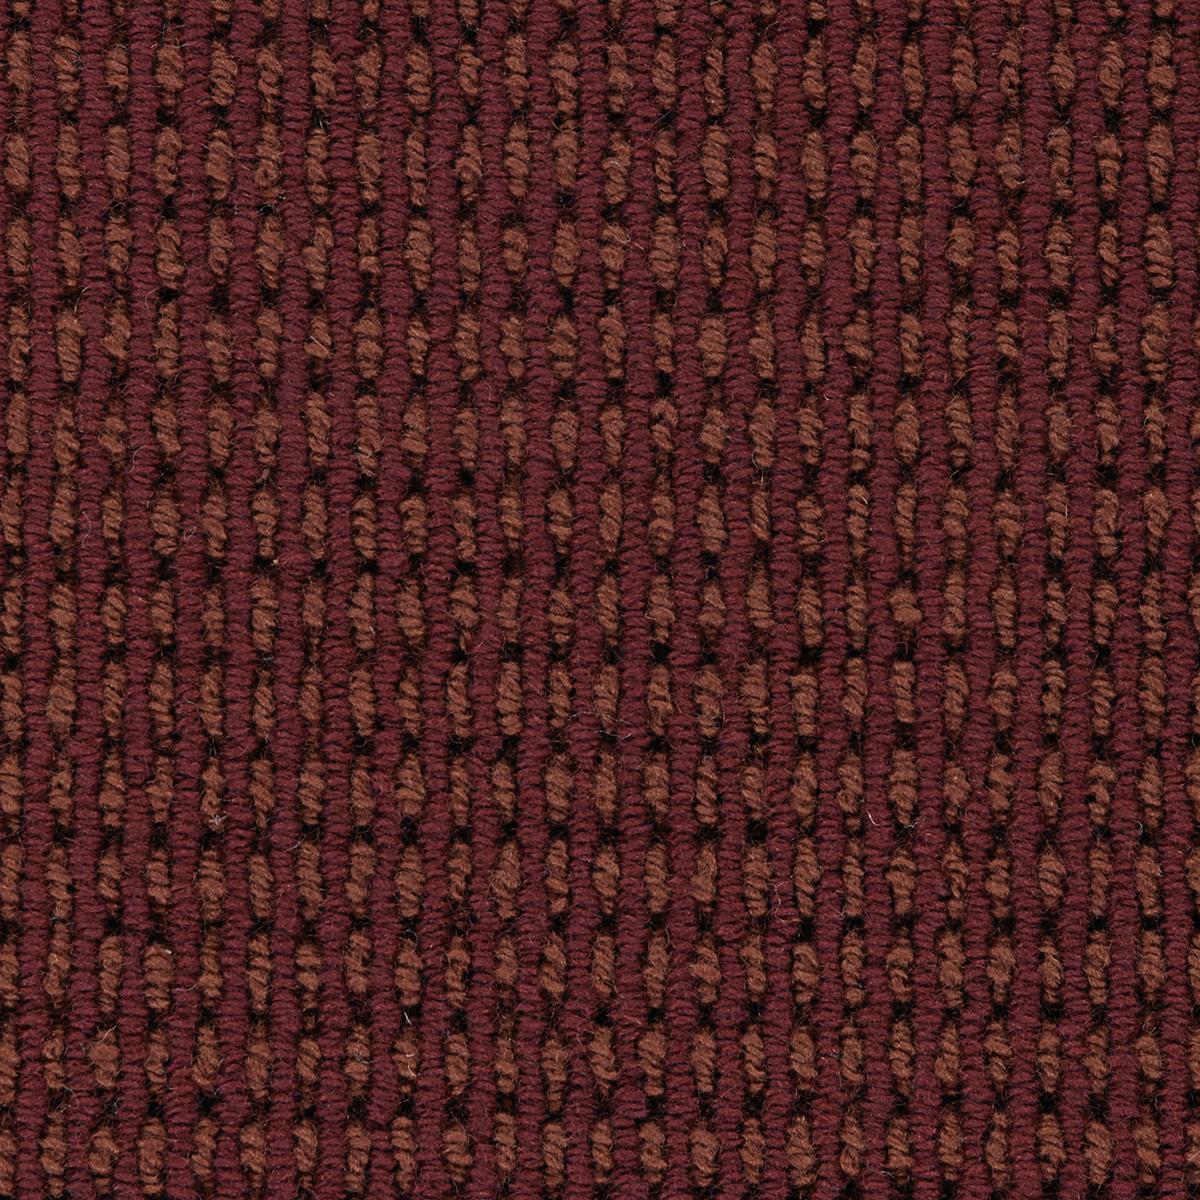 Cordovan J Mish Mills Wool Carpet Rugs